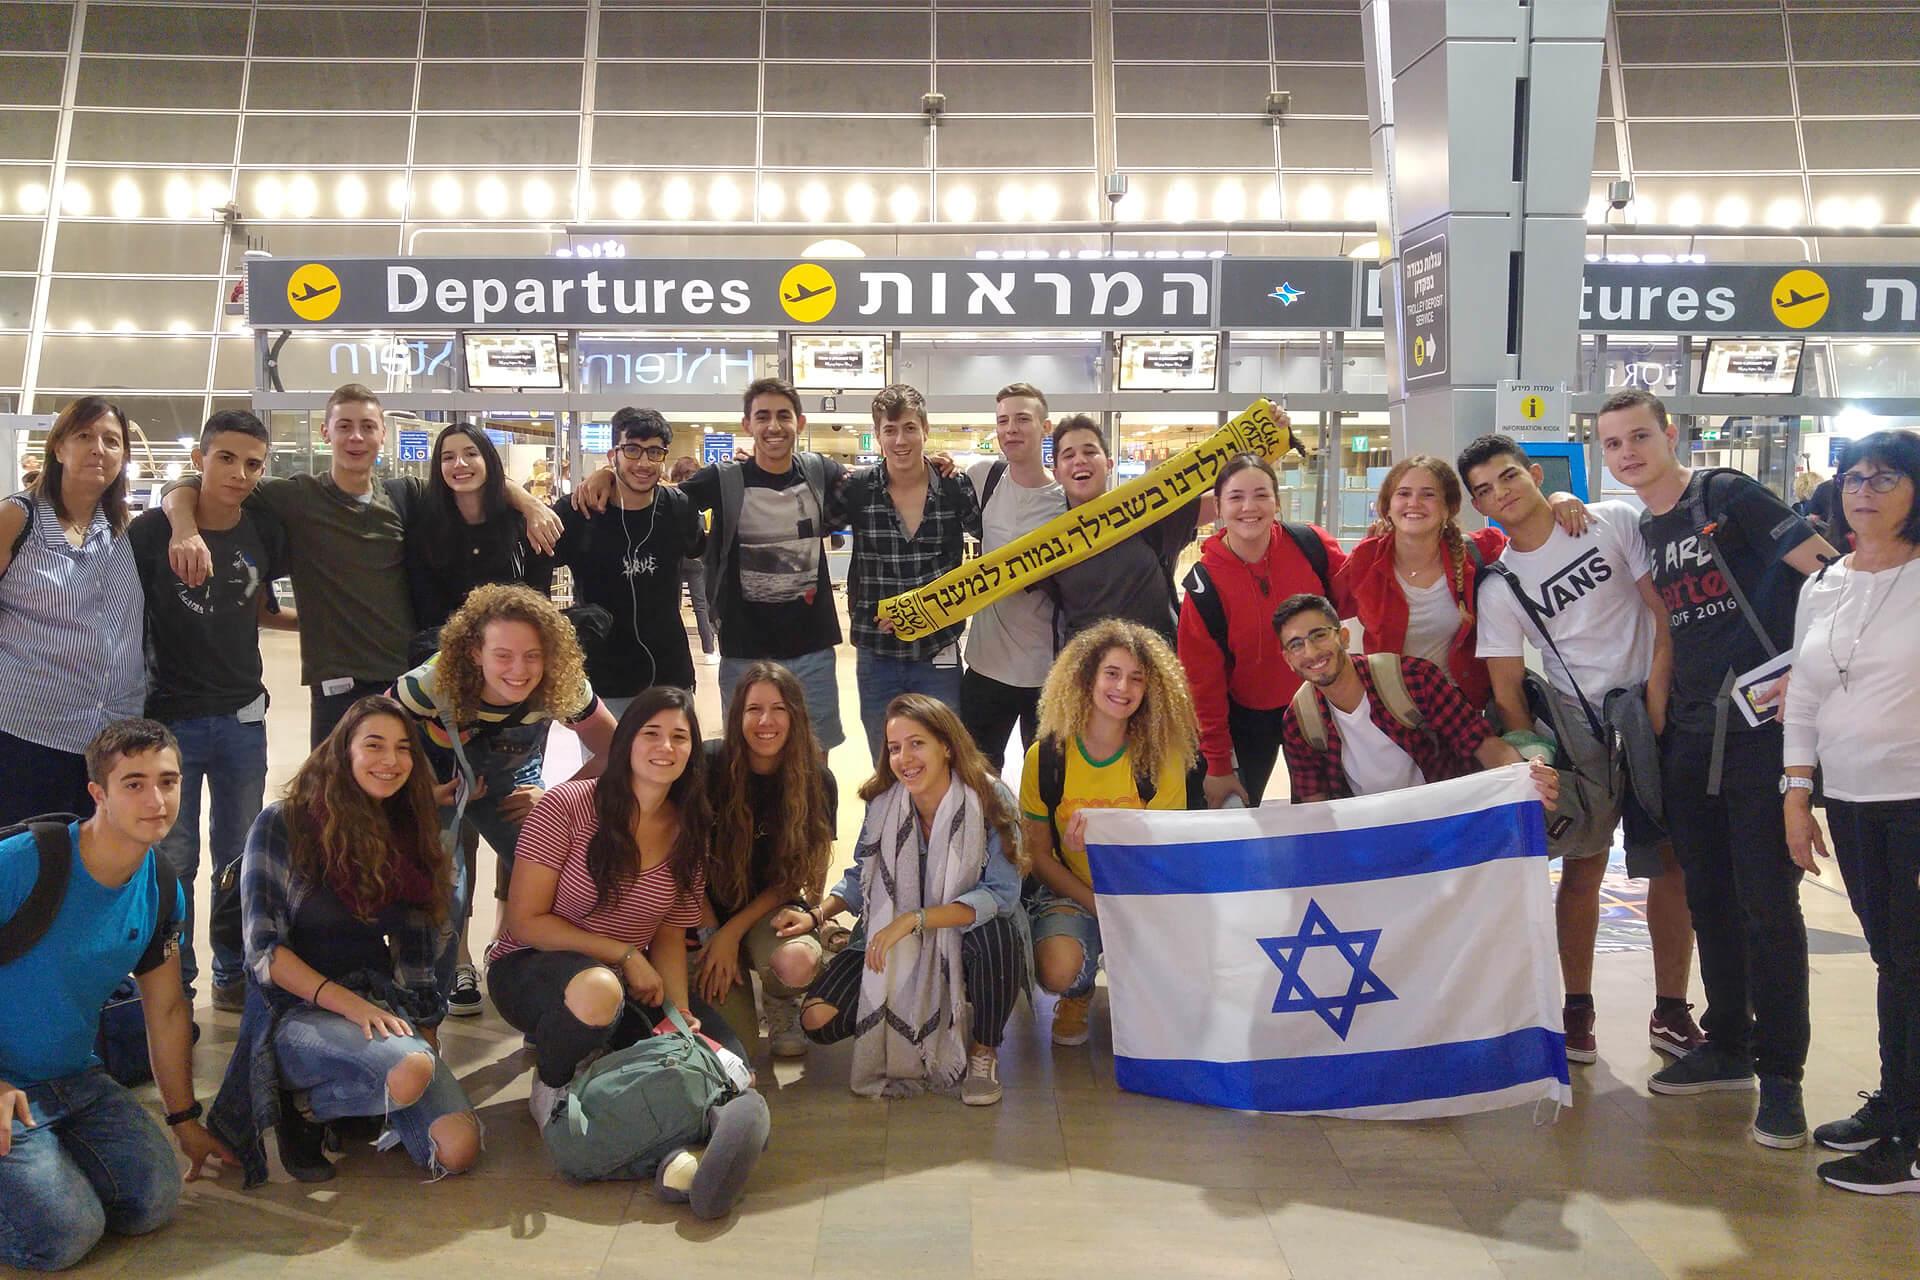 2018 10 06 Israelaustausch Weiden Content Beitragsbild 28